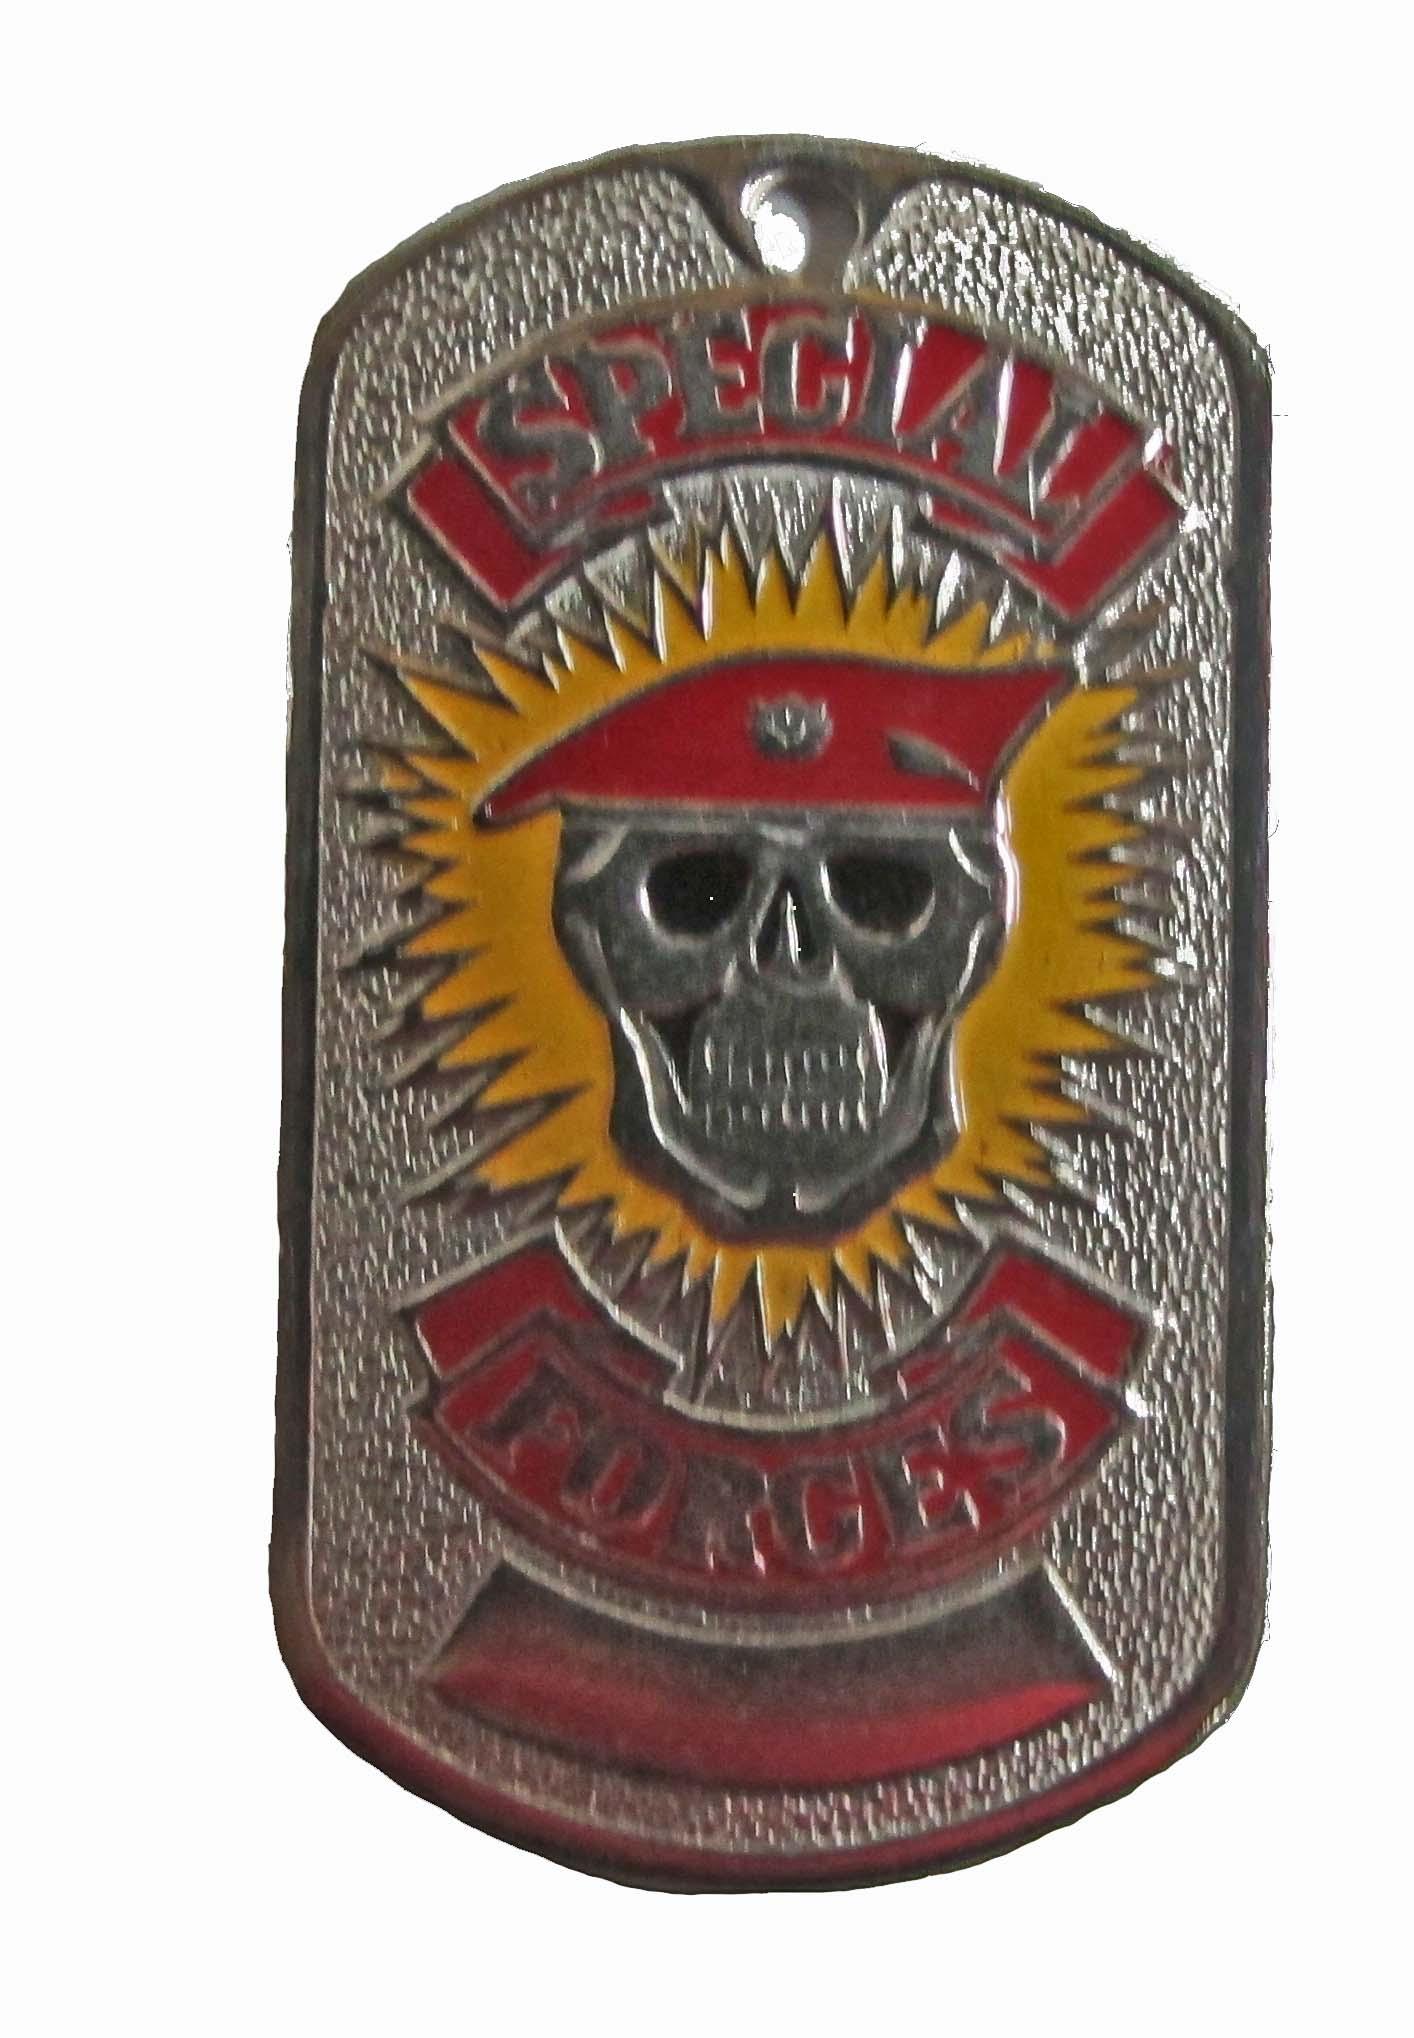 Жетон 2-4 SPECIAL FORCES череп красный берет металл